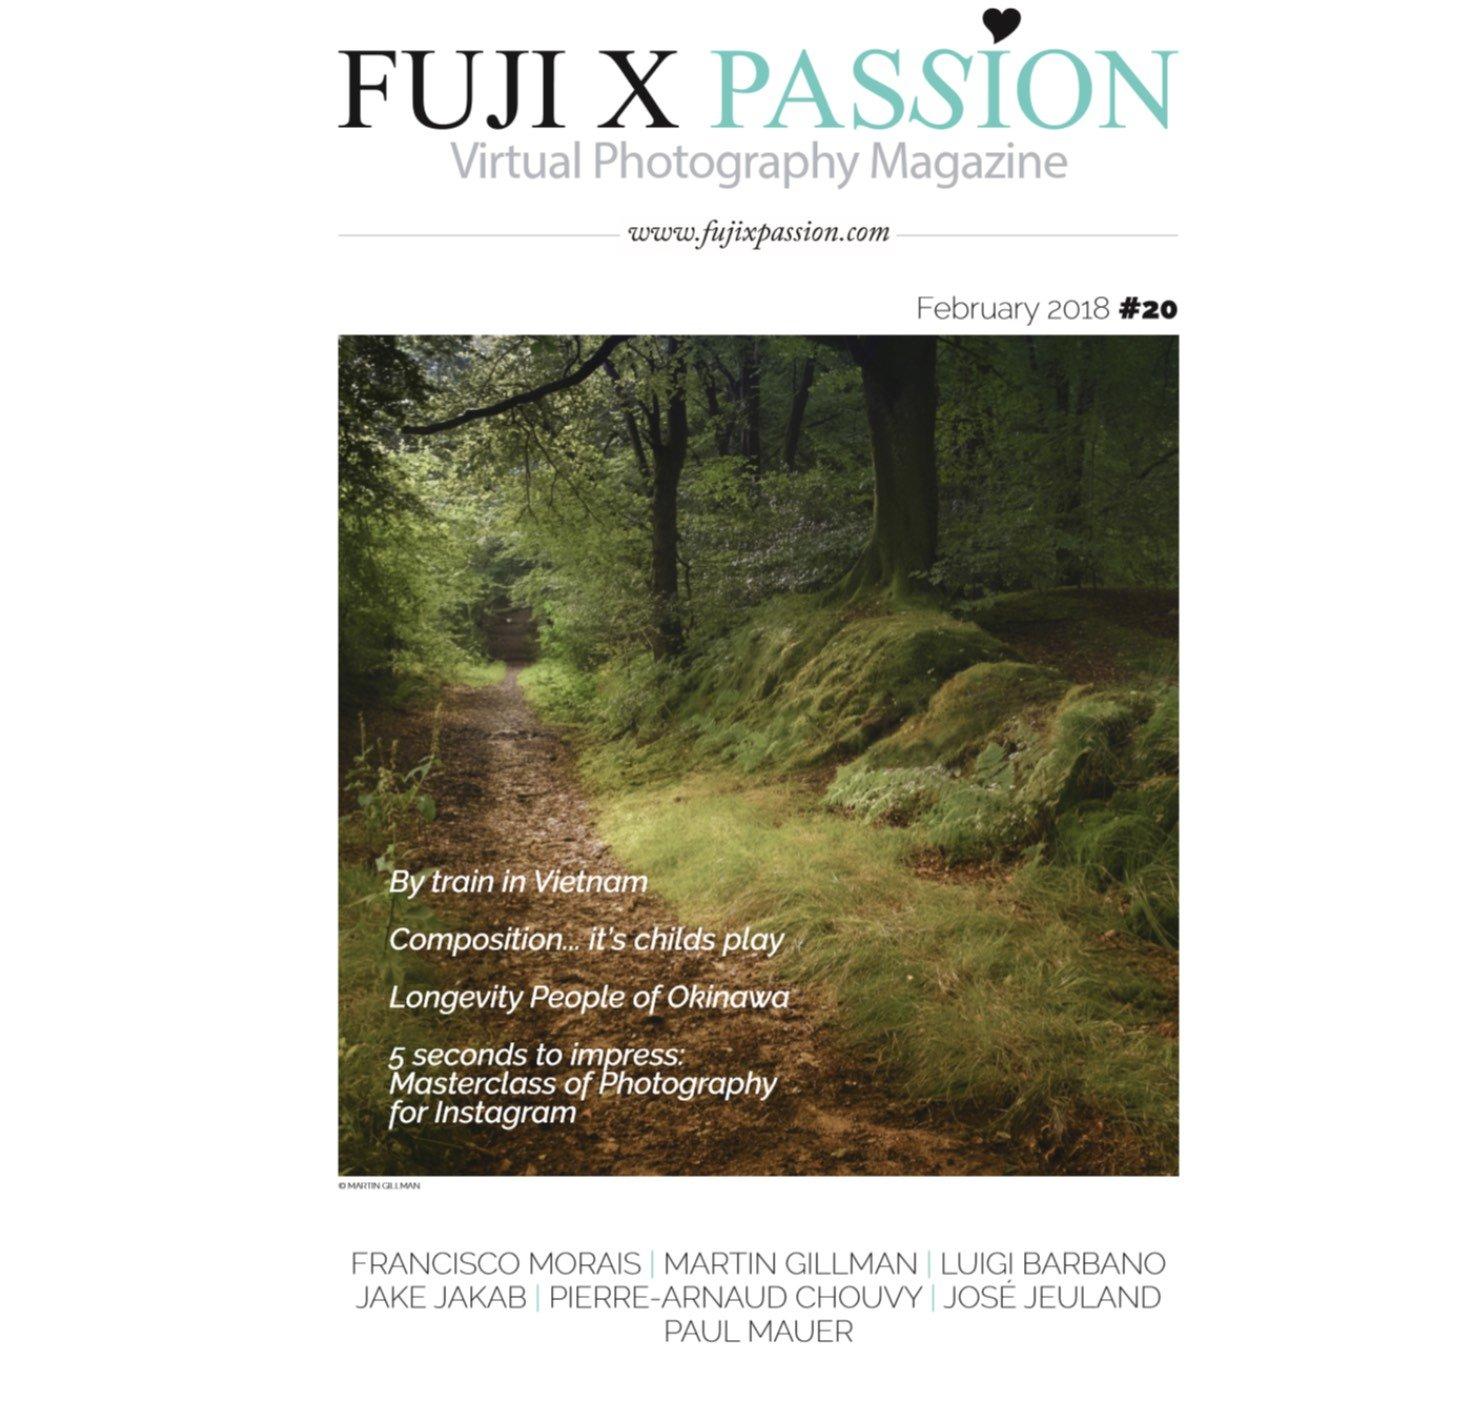 FUJI X Passion Longevity Okinawa Jose Jeuland 1